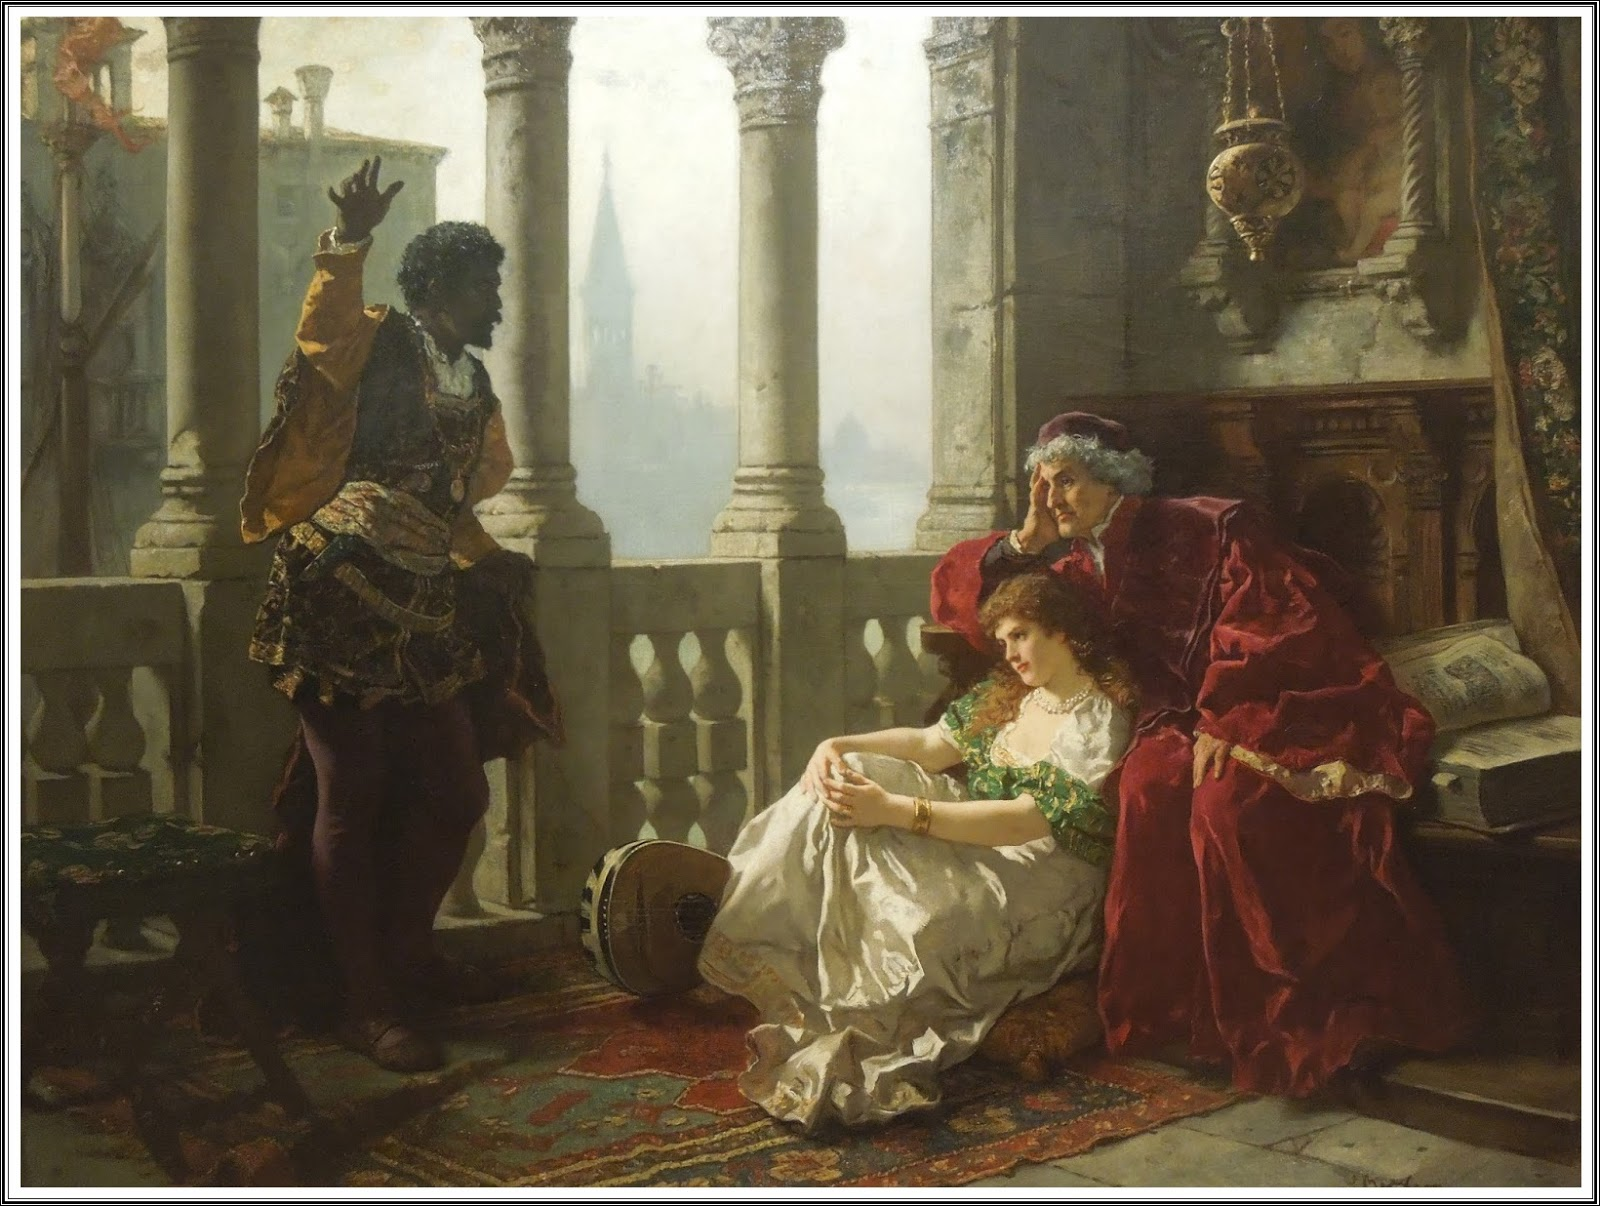 Laufschuhe an vorderster Front der Zeit gut kaufen Le Prince Lointain: Carl Ludwig Friedrich Becker (1820-1900 ...